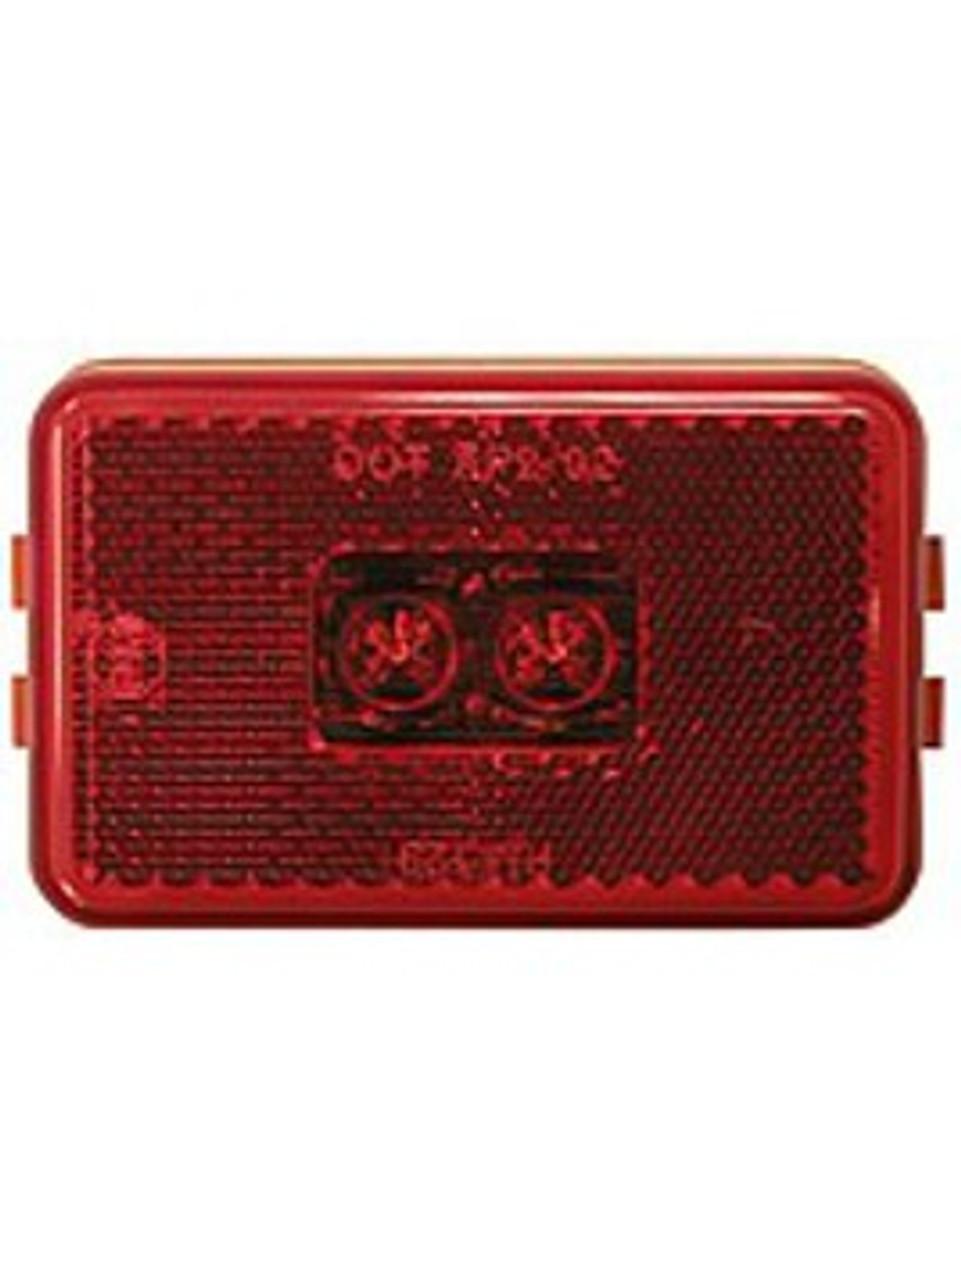 LED129R2 --- LED Rectangular Sealed Clearance/Side Marker Light - Red